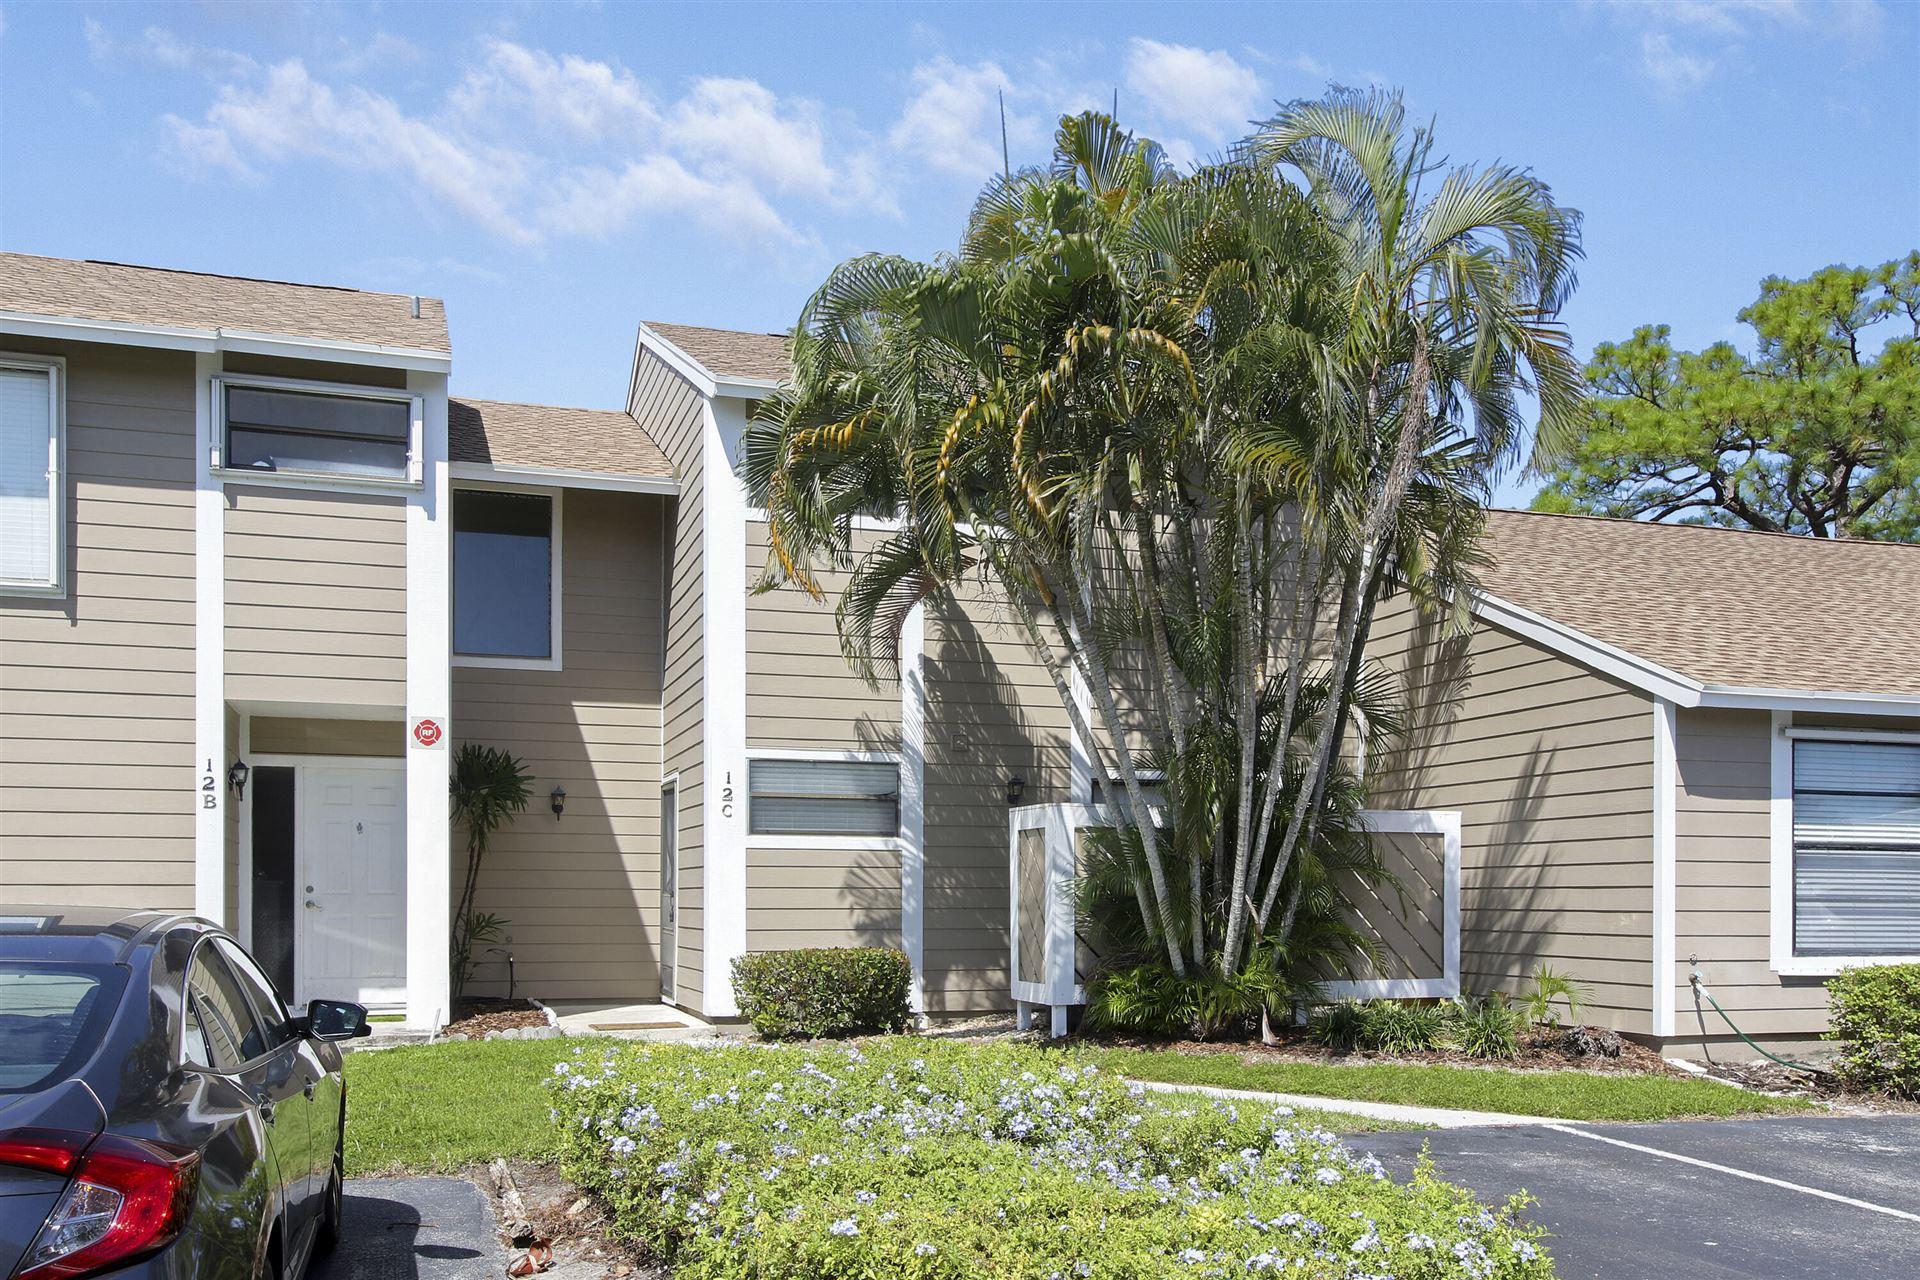 Photo for 201 Lakewood Drive #12c, Jupiter, FL 33458 (MLS # RX-10751766)